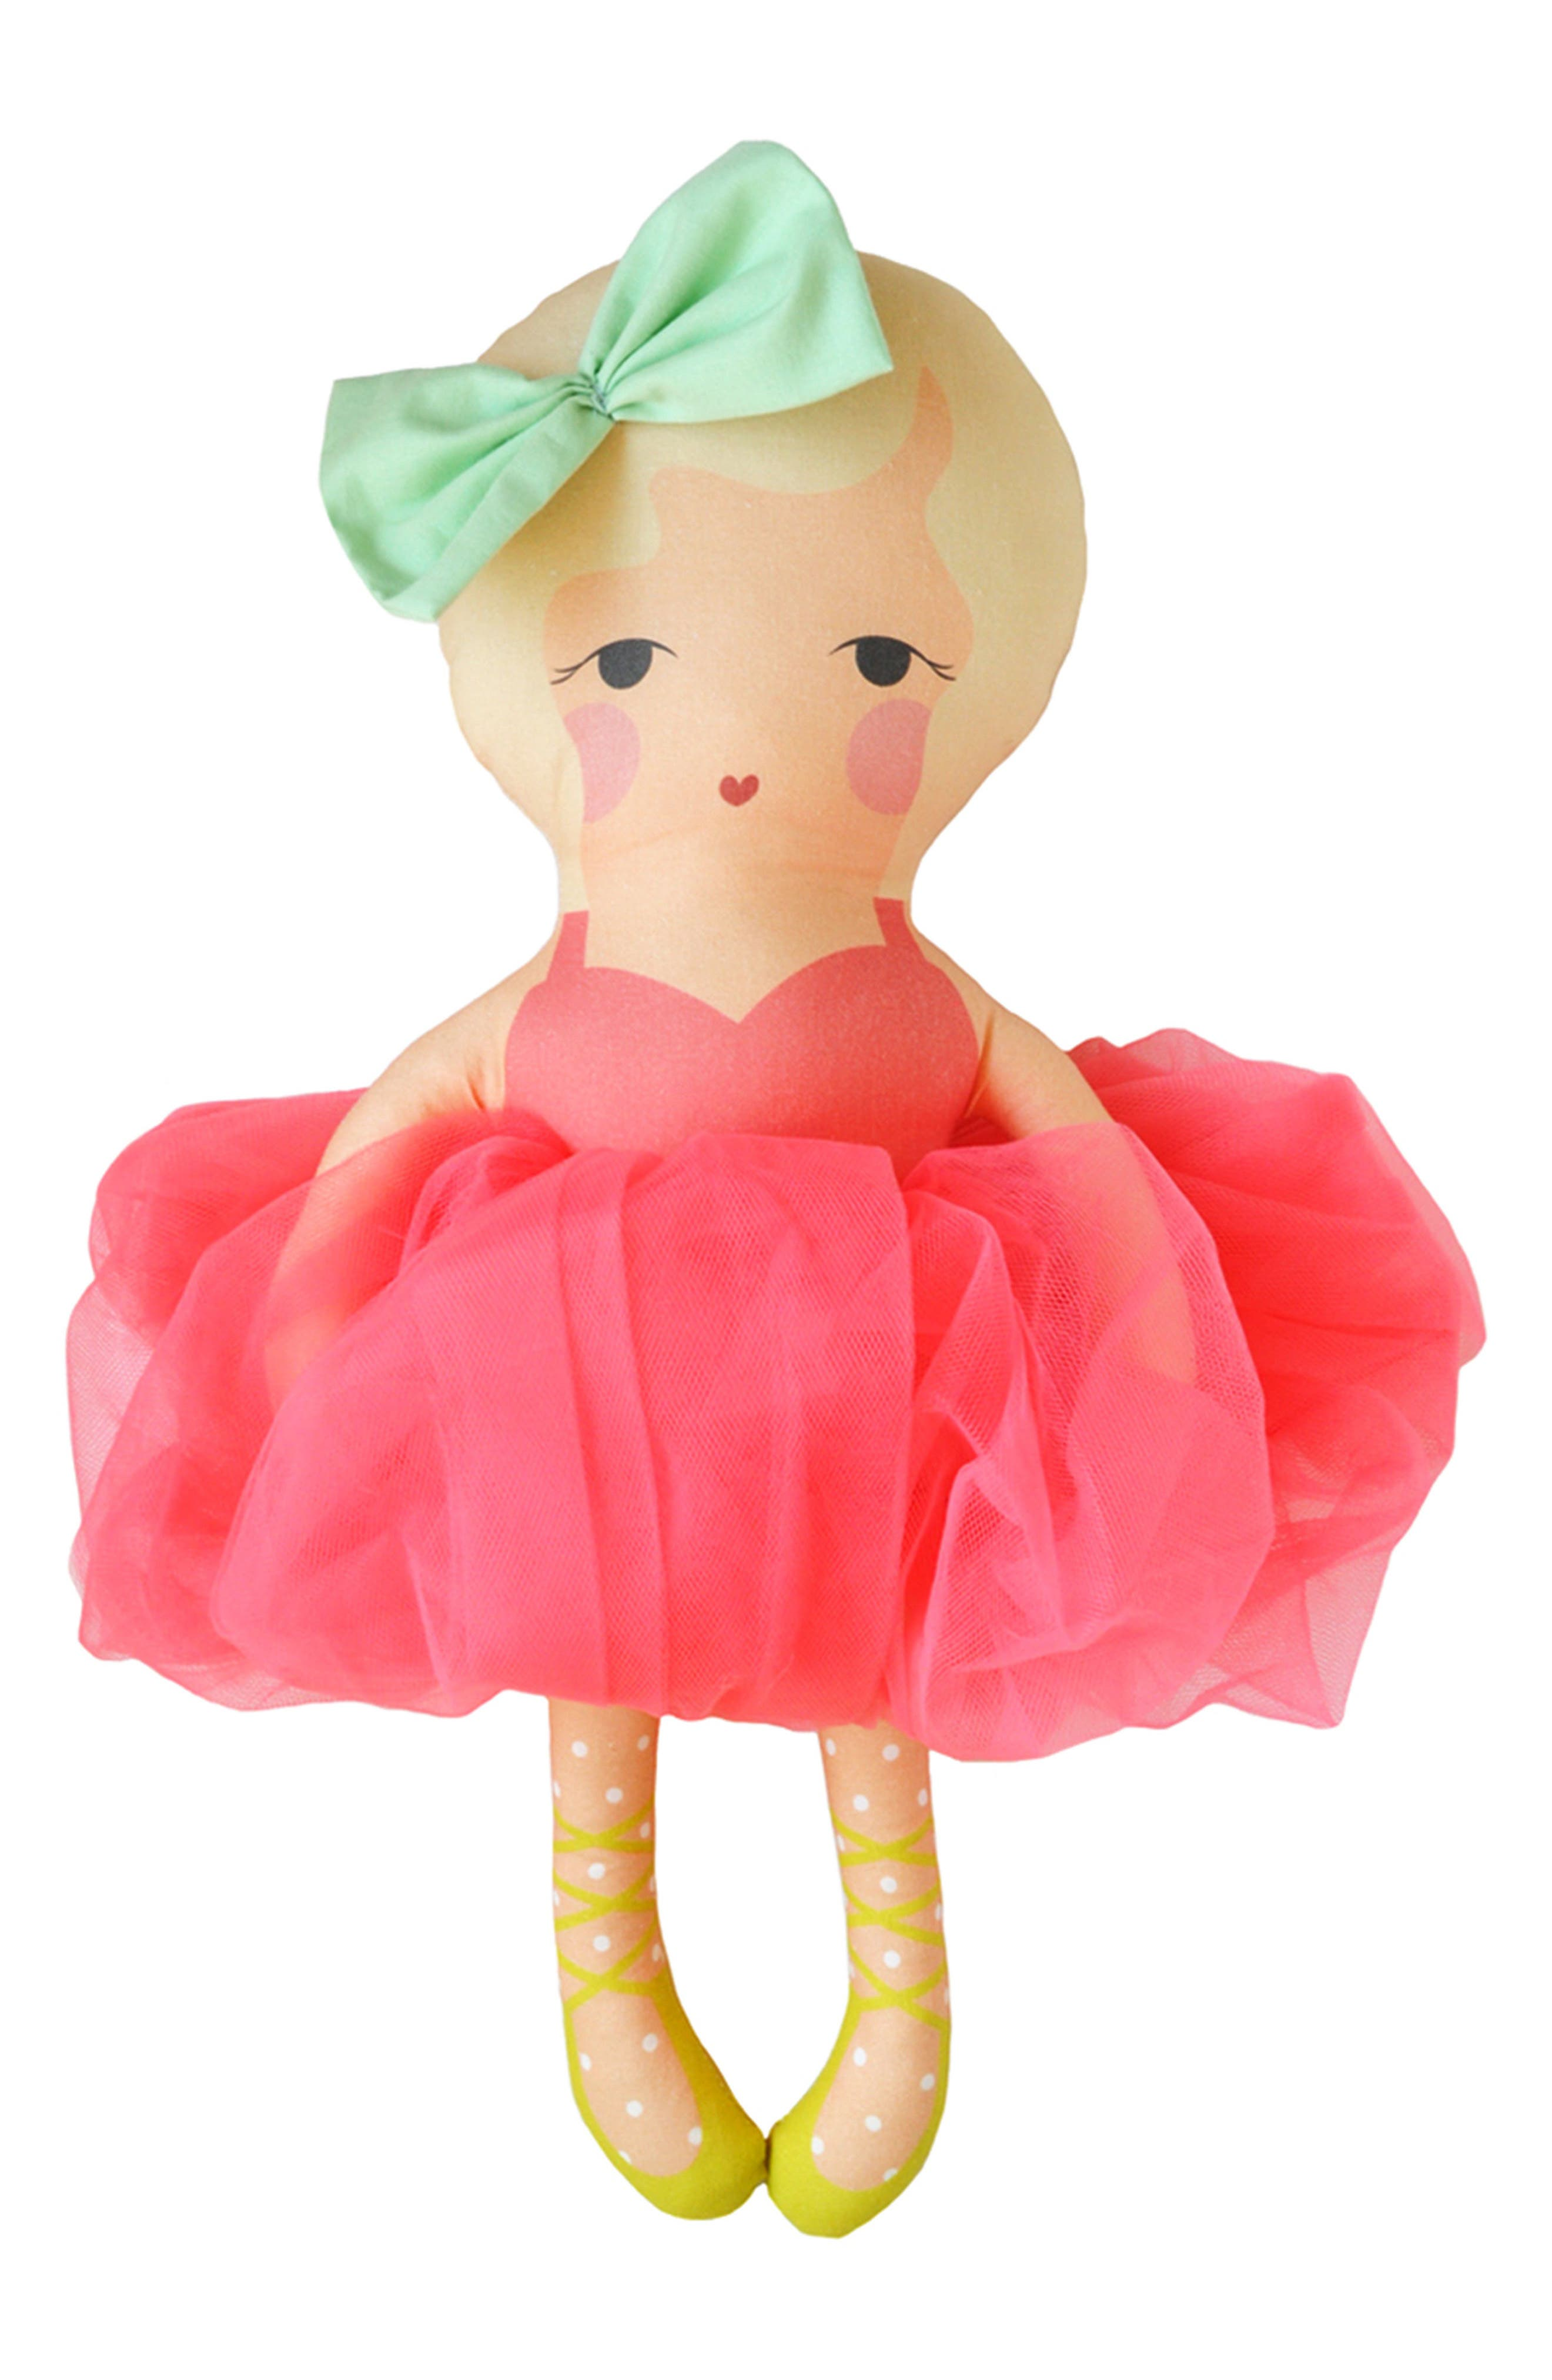 Candy Kirby Designs Grace Ballerina Doll